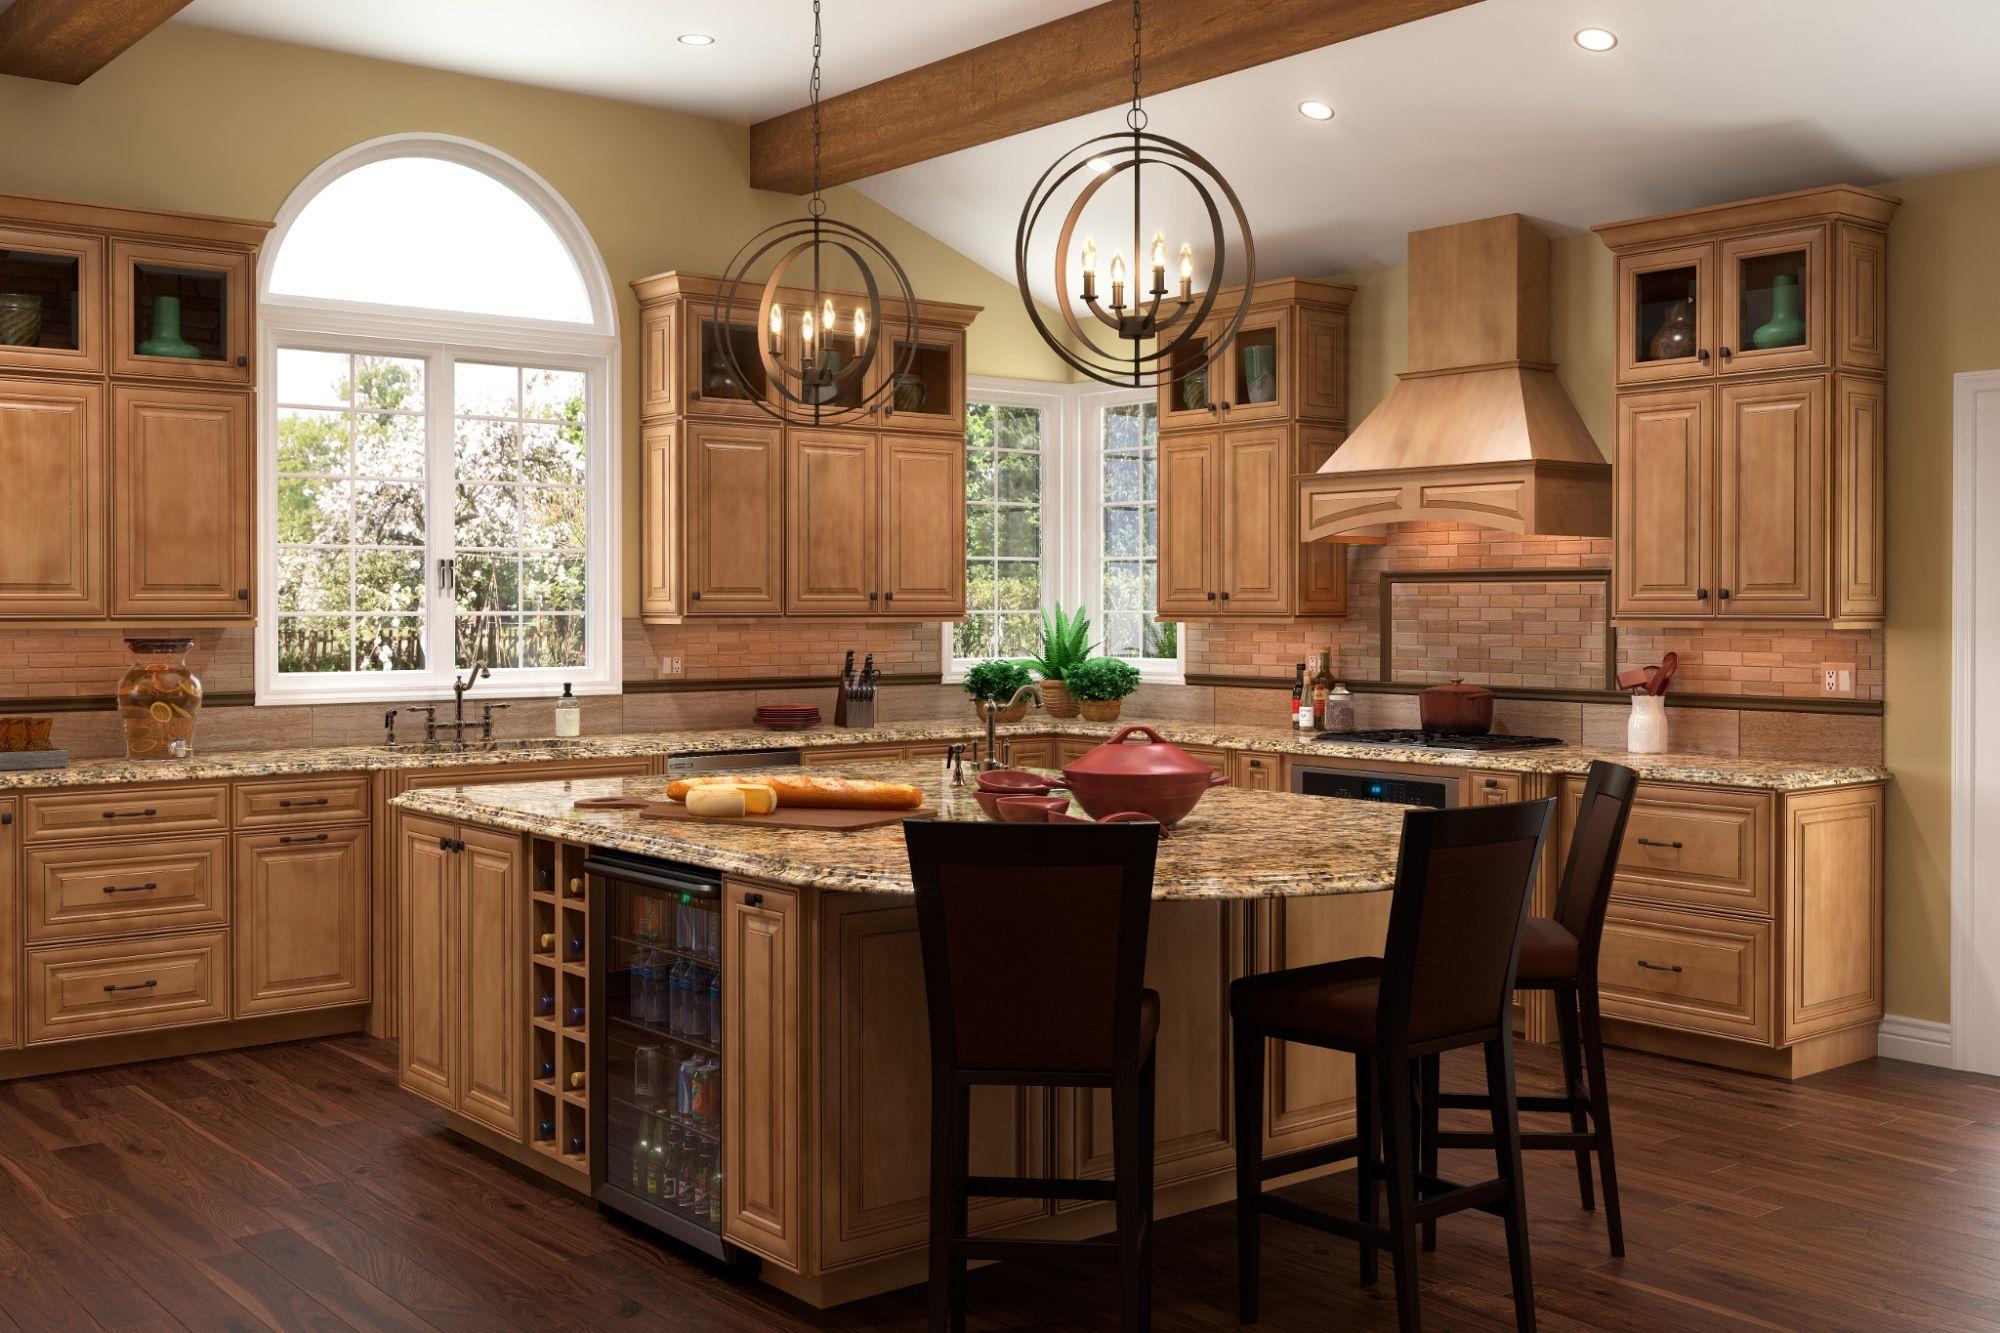 Inspiration Modal Image   Quality kitchen cabinets, Glazed ...